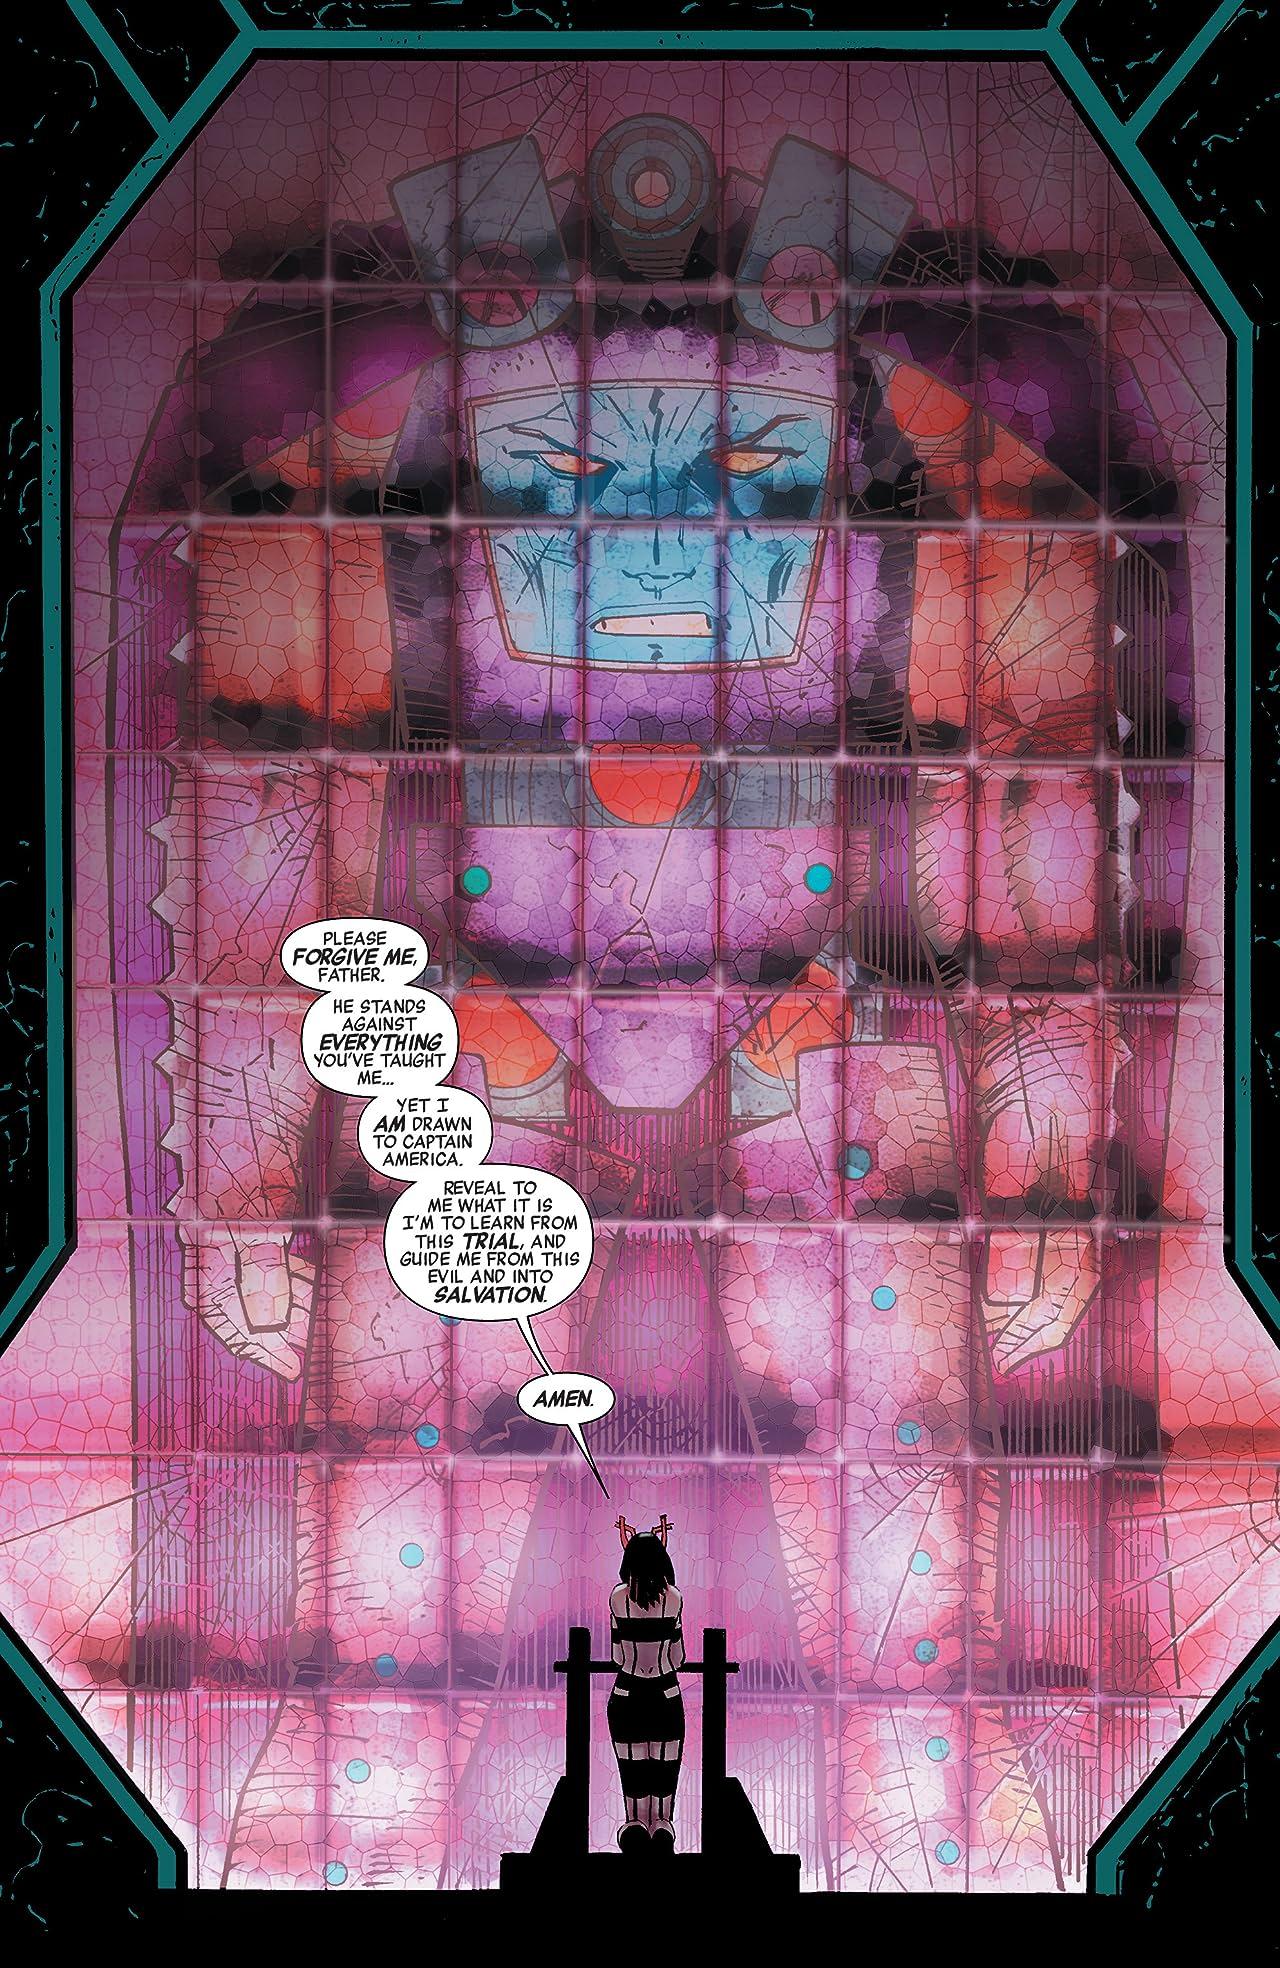 Captain America Vol. 2: Castaway In Dimension Z - Book 2